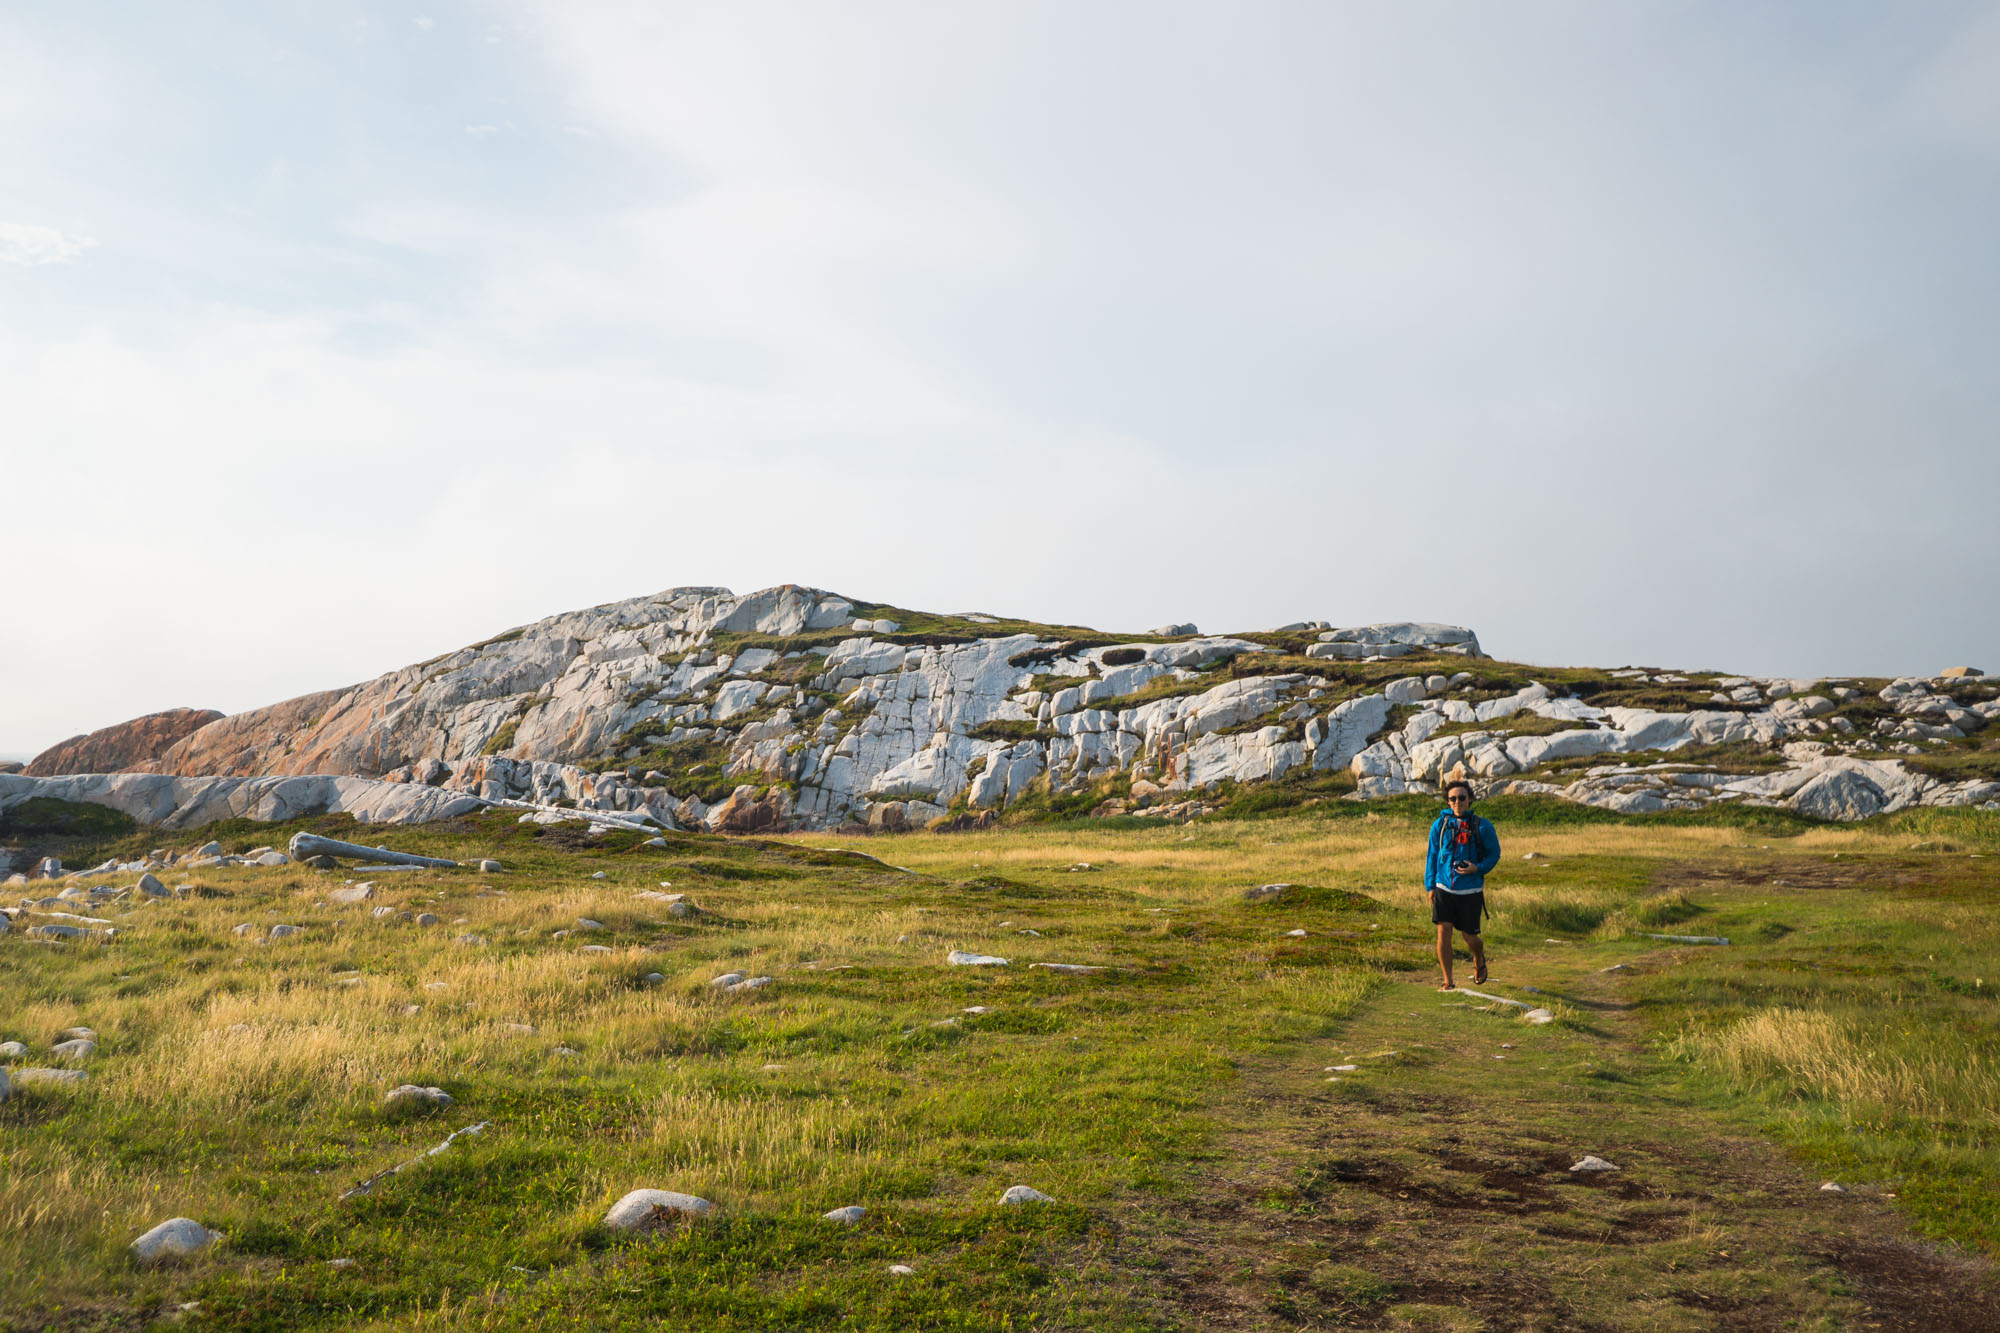 Owen hiking on the Joe Batt's Arm trail